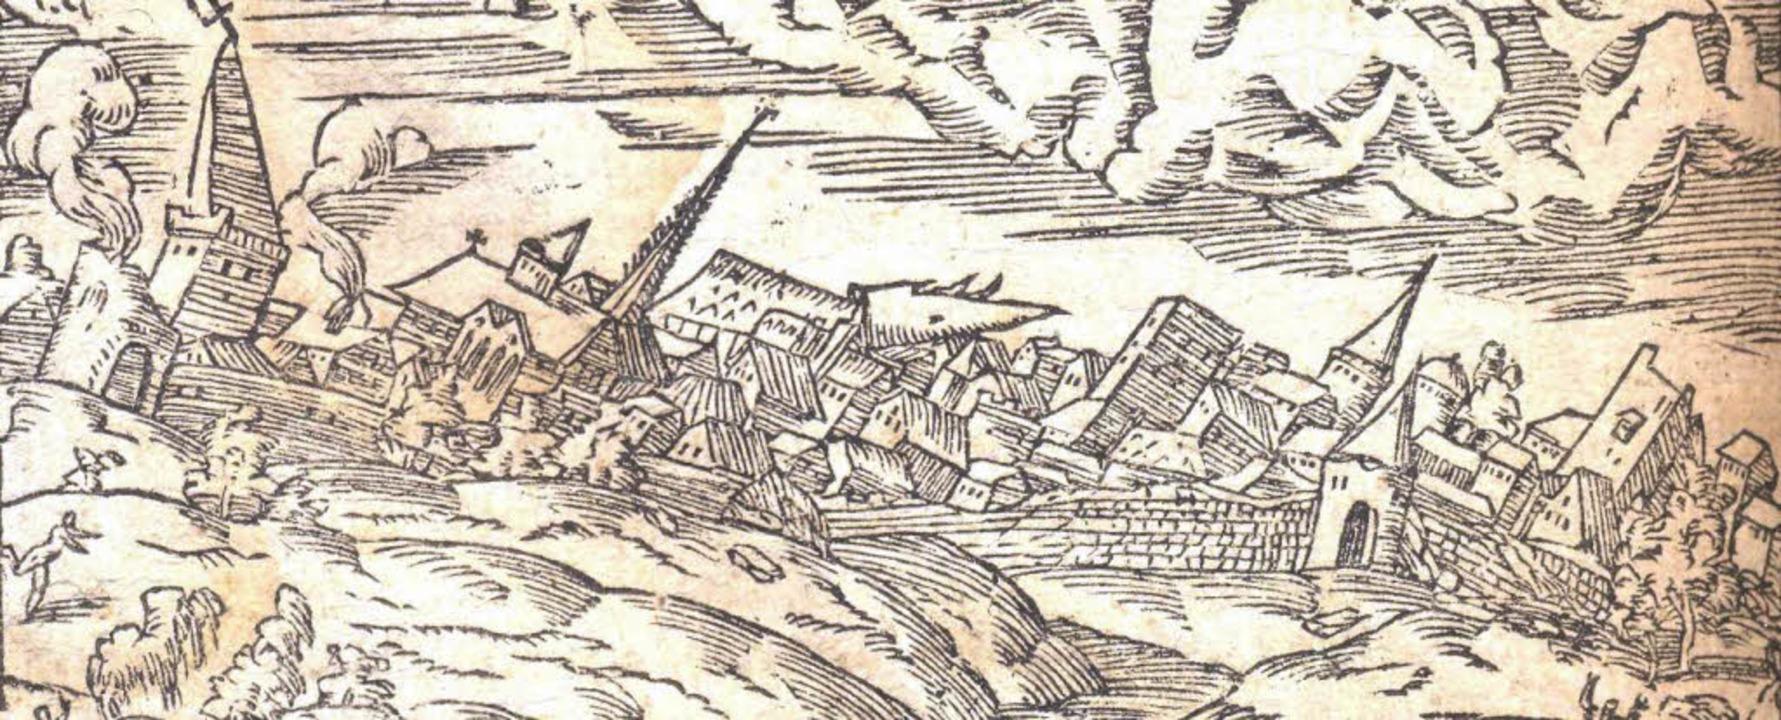 Das verheerende Basler Erdbeben, das s...torischen Erdbeben sehr gut erforscht.  | Foto: Museum am Burghof